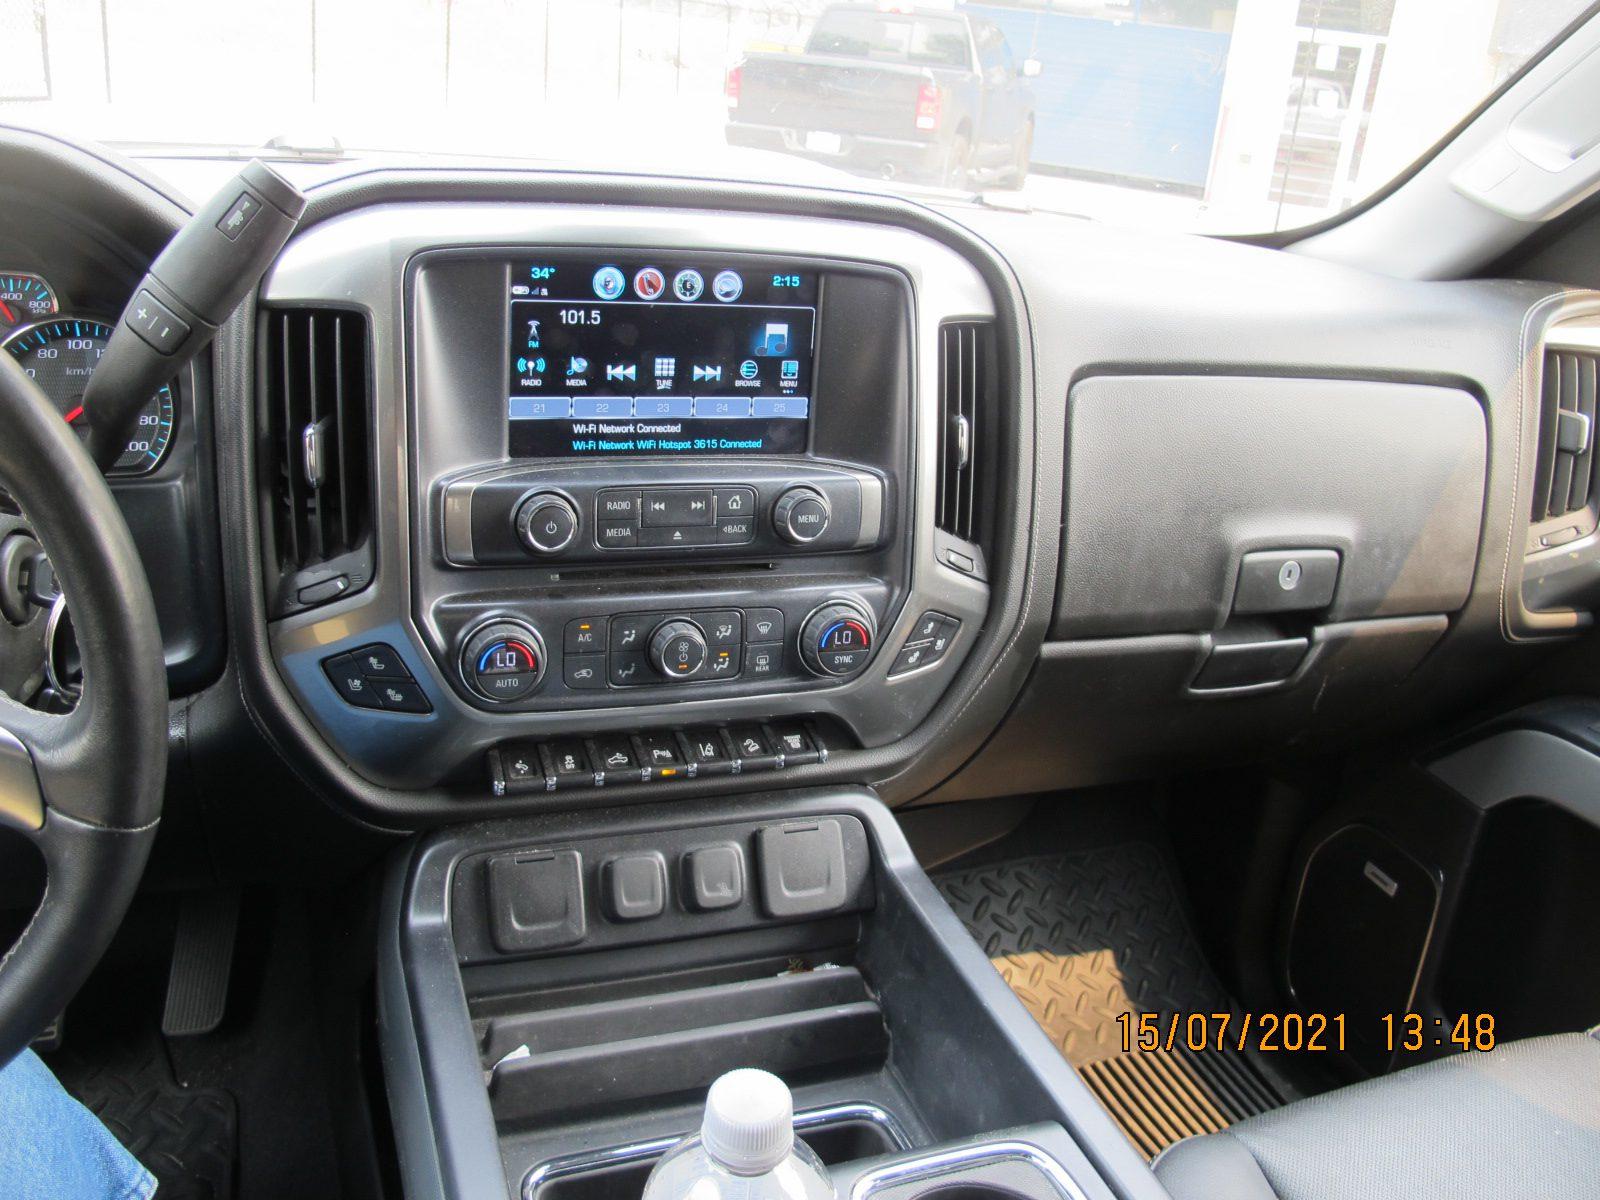 2019 Chevrolet Silverado Duramax Z71 3500 #B-KEL-0393 Located in Kelowna